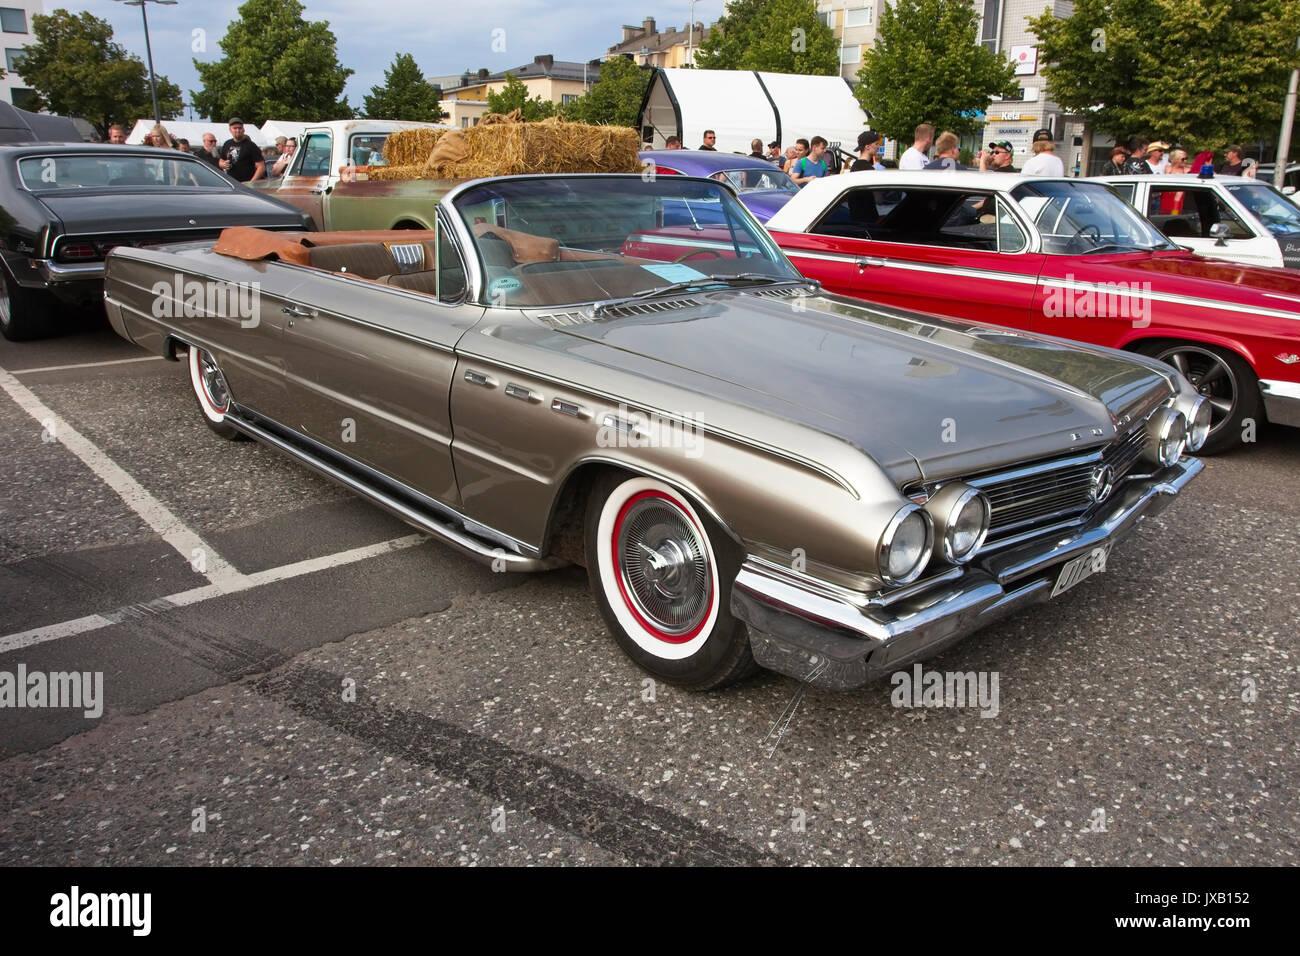 Buick Electra Stock Photos Images Alamy 1961 Convertible 1962 225 Image